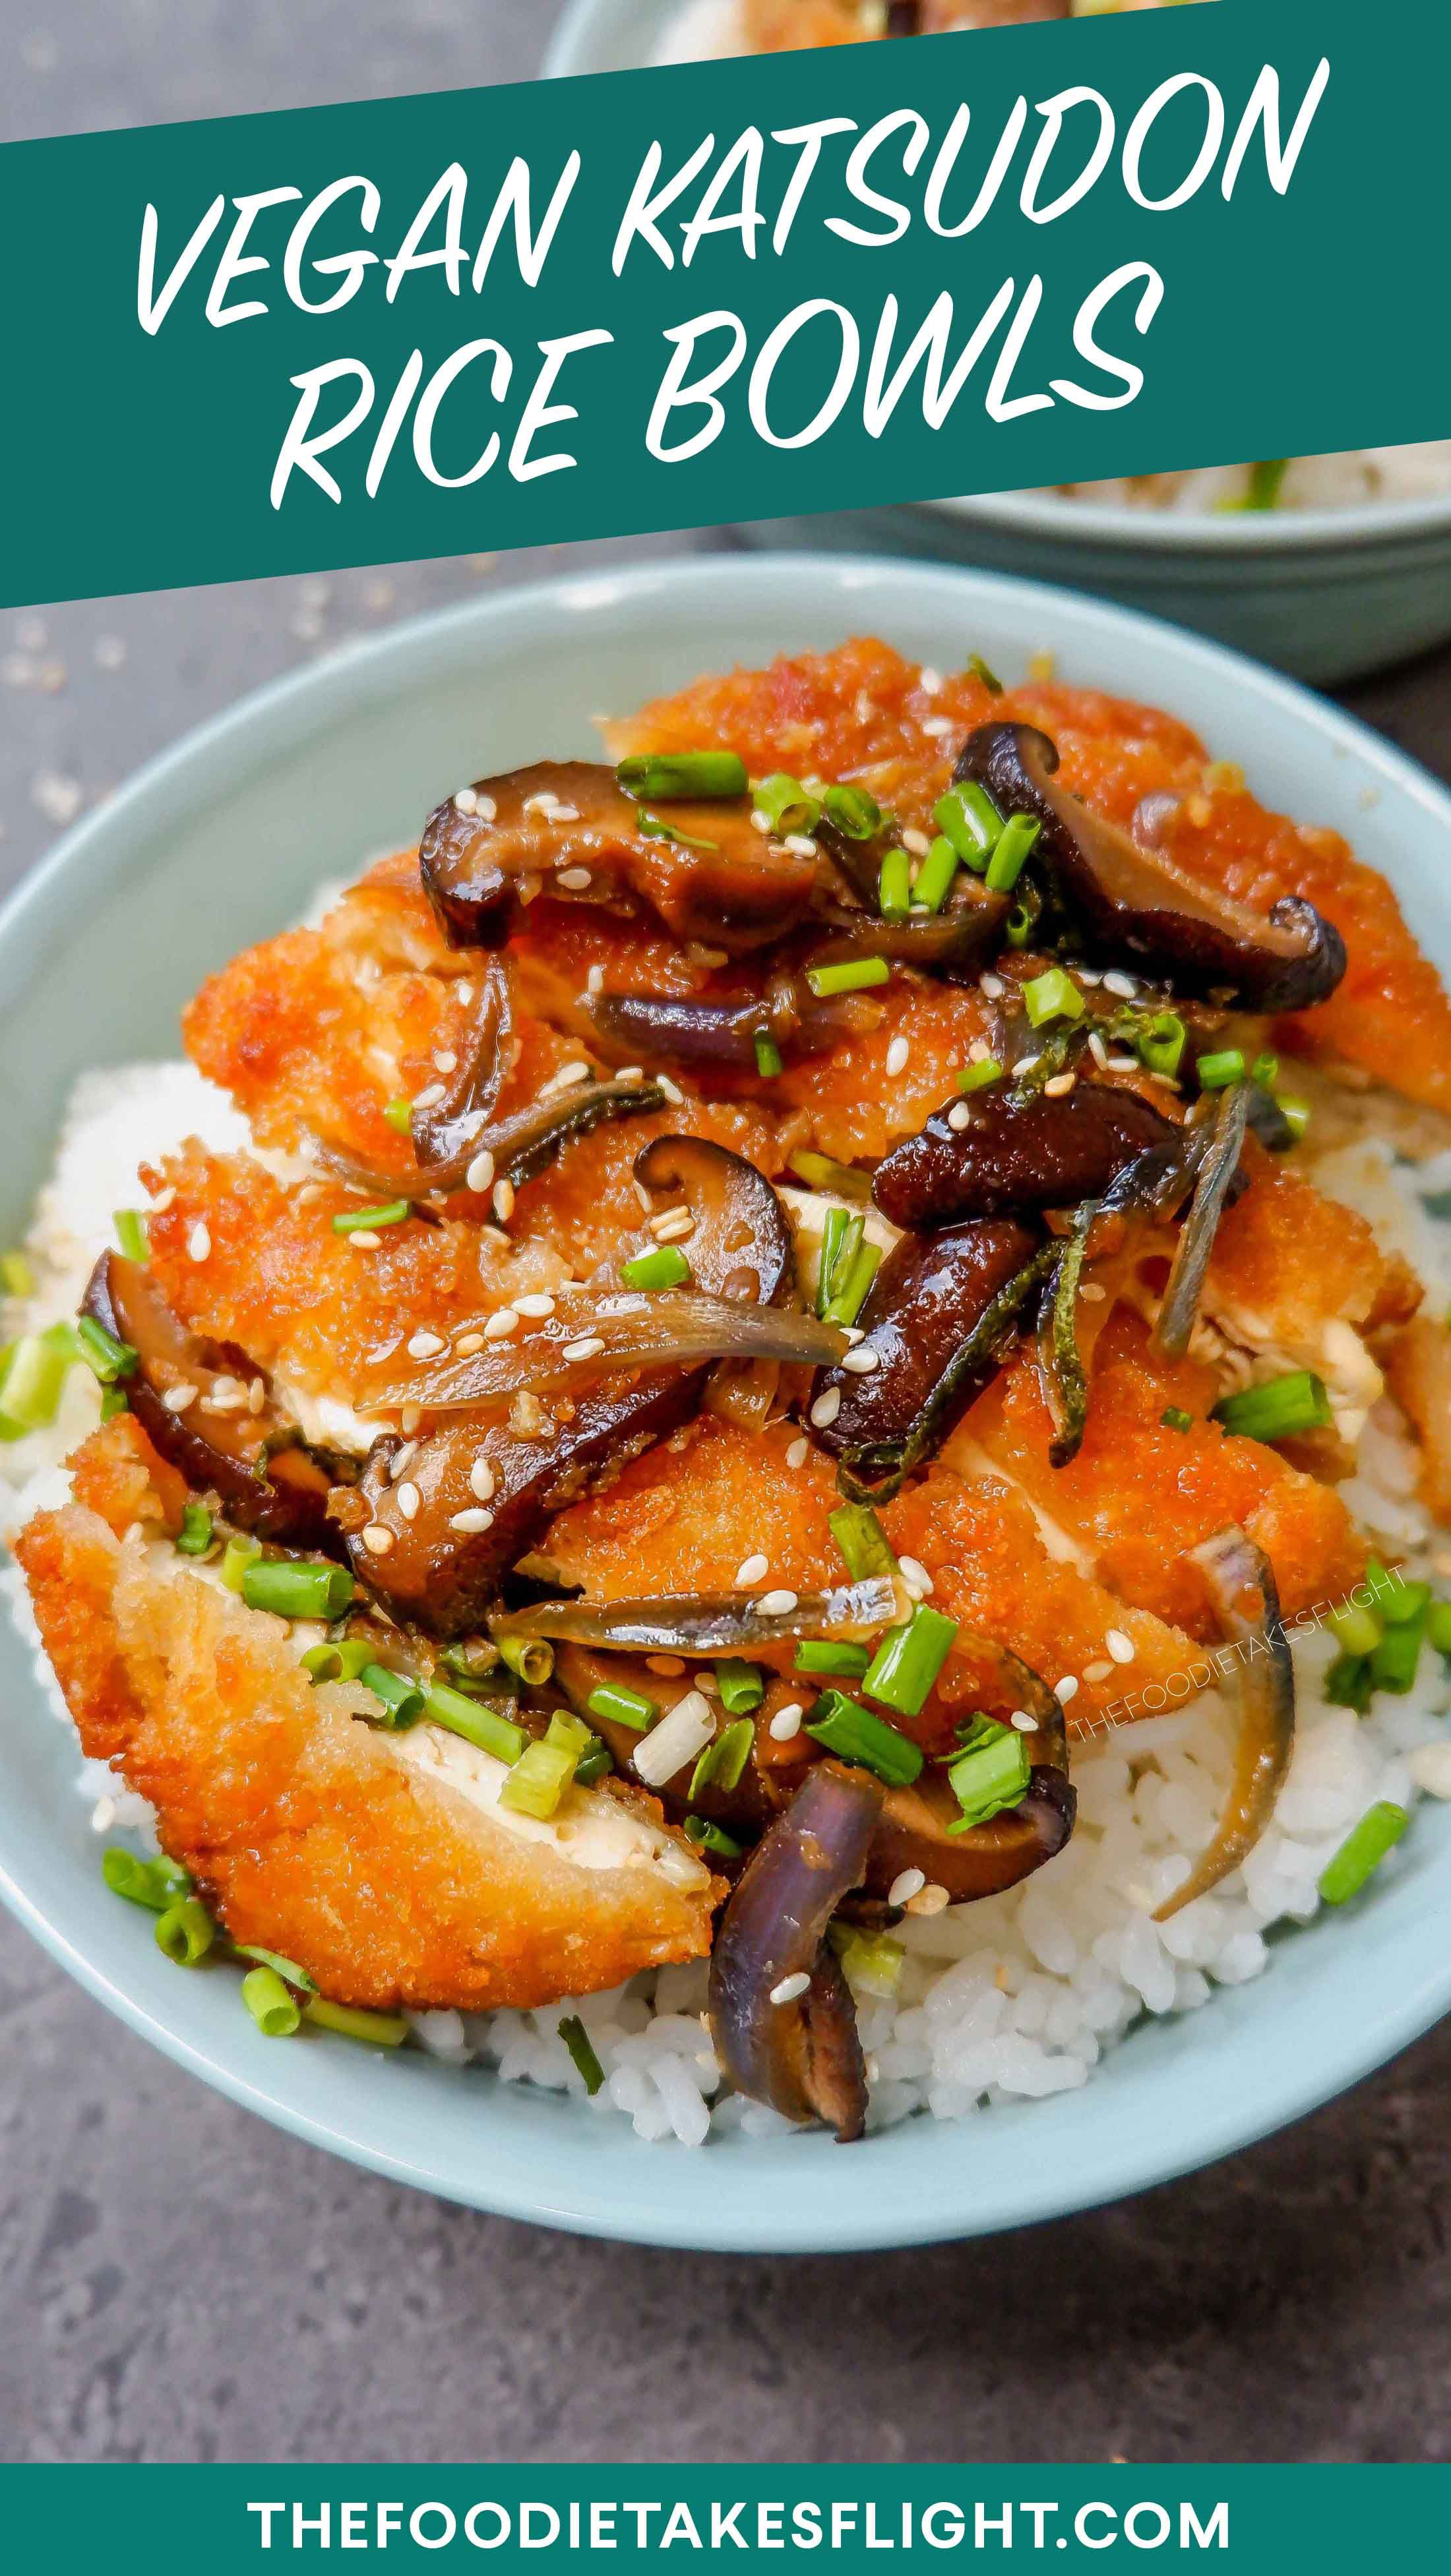 Japanese Style Katsudon Rice Bowls Vegan Recipe Recipe Easy Japanese Recipes Recipes Vegan Recipes